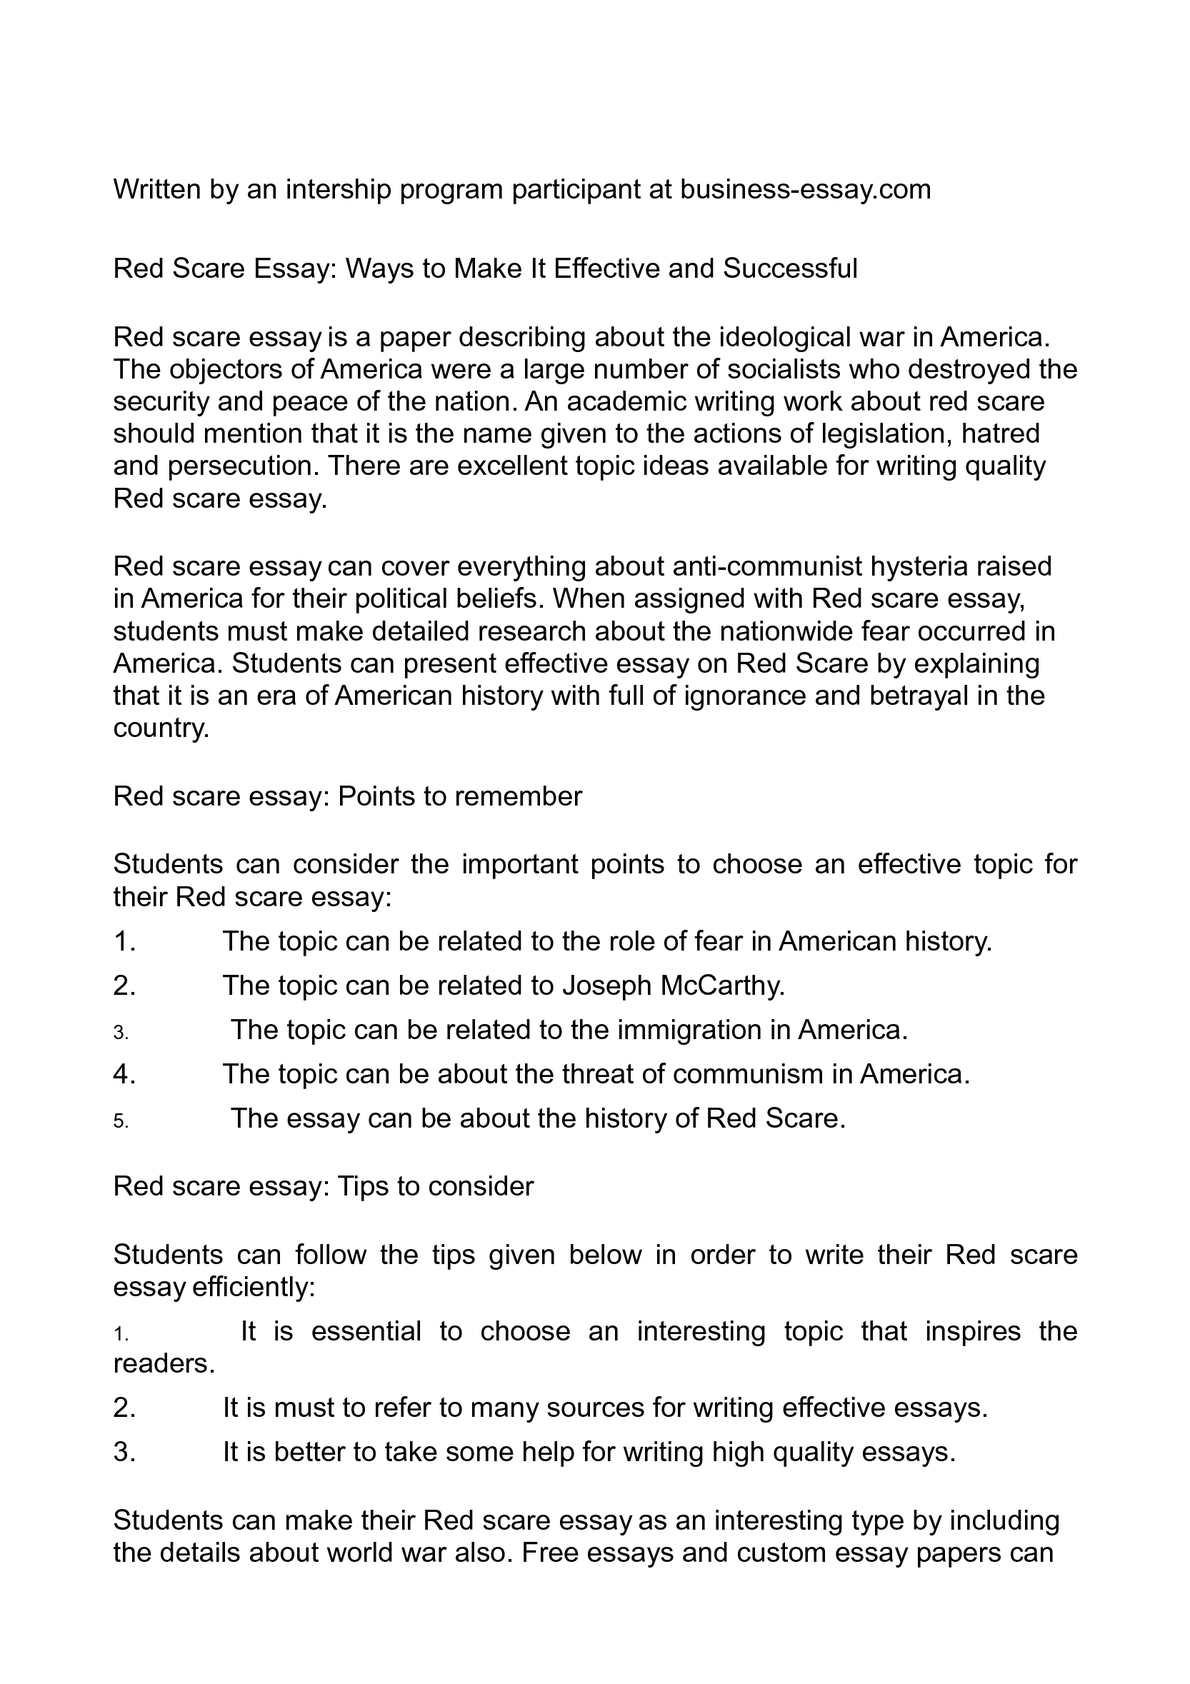 essay on hatredness